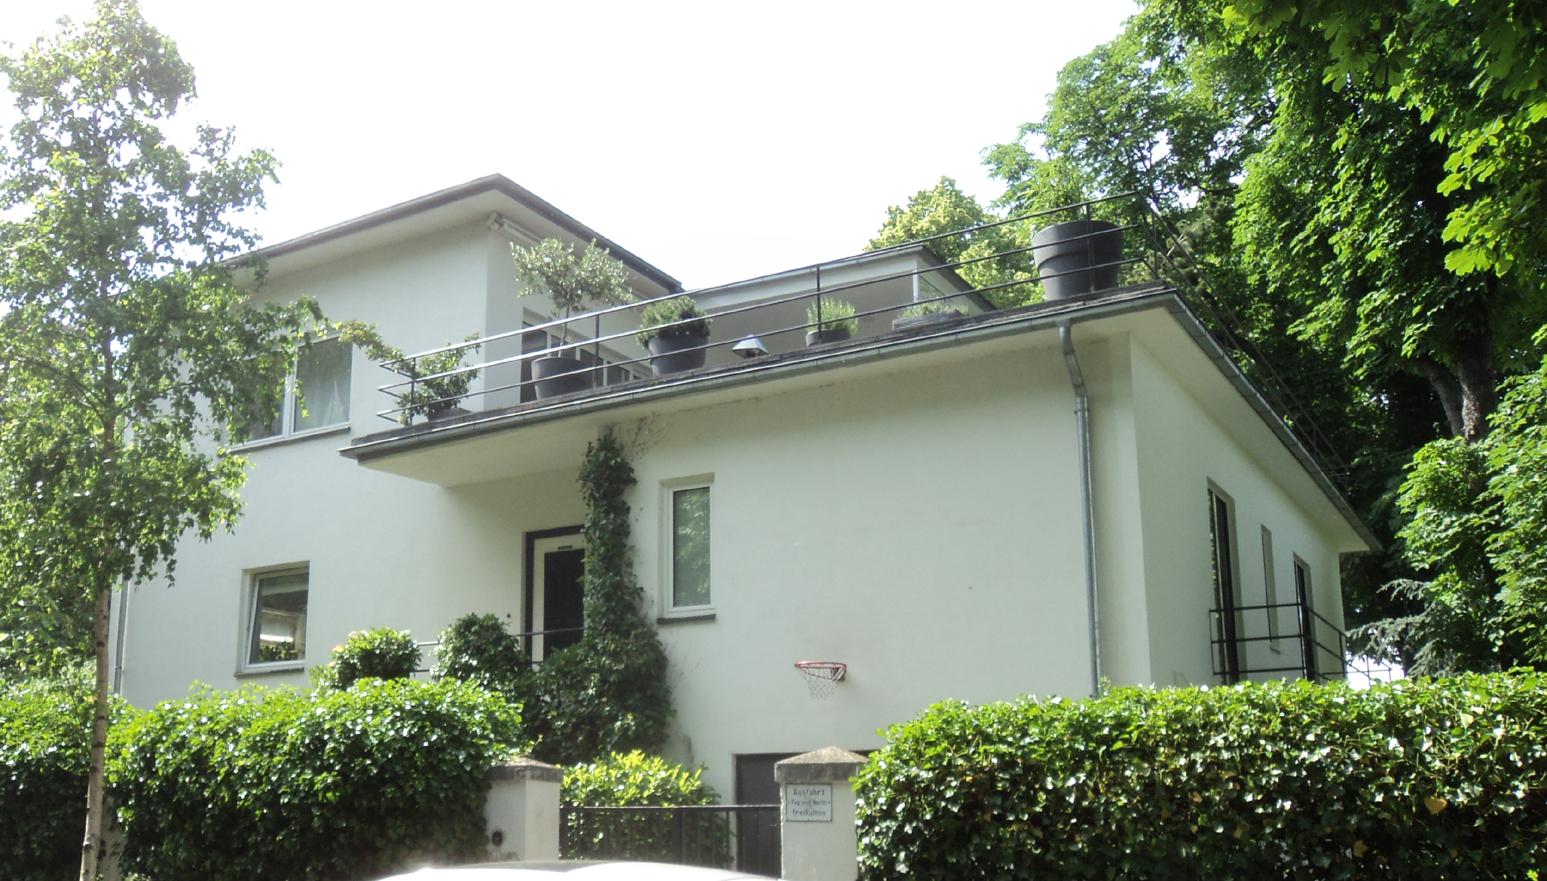 Villenführung: Bauhaus und klassische Villen in Rodenkirchen am 6.5.2018